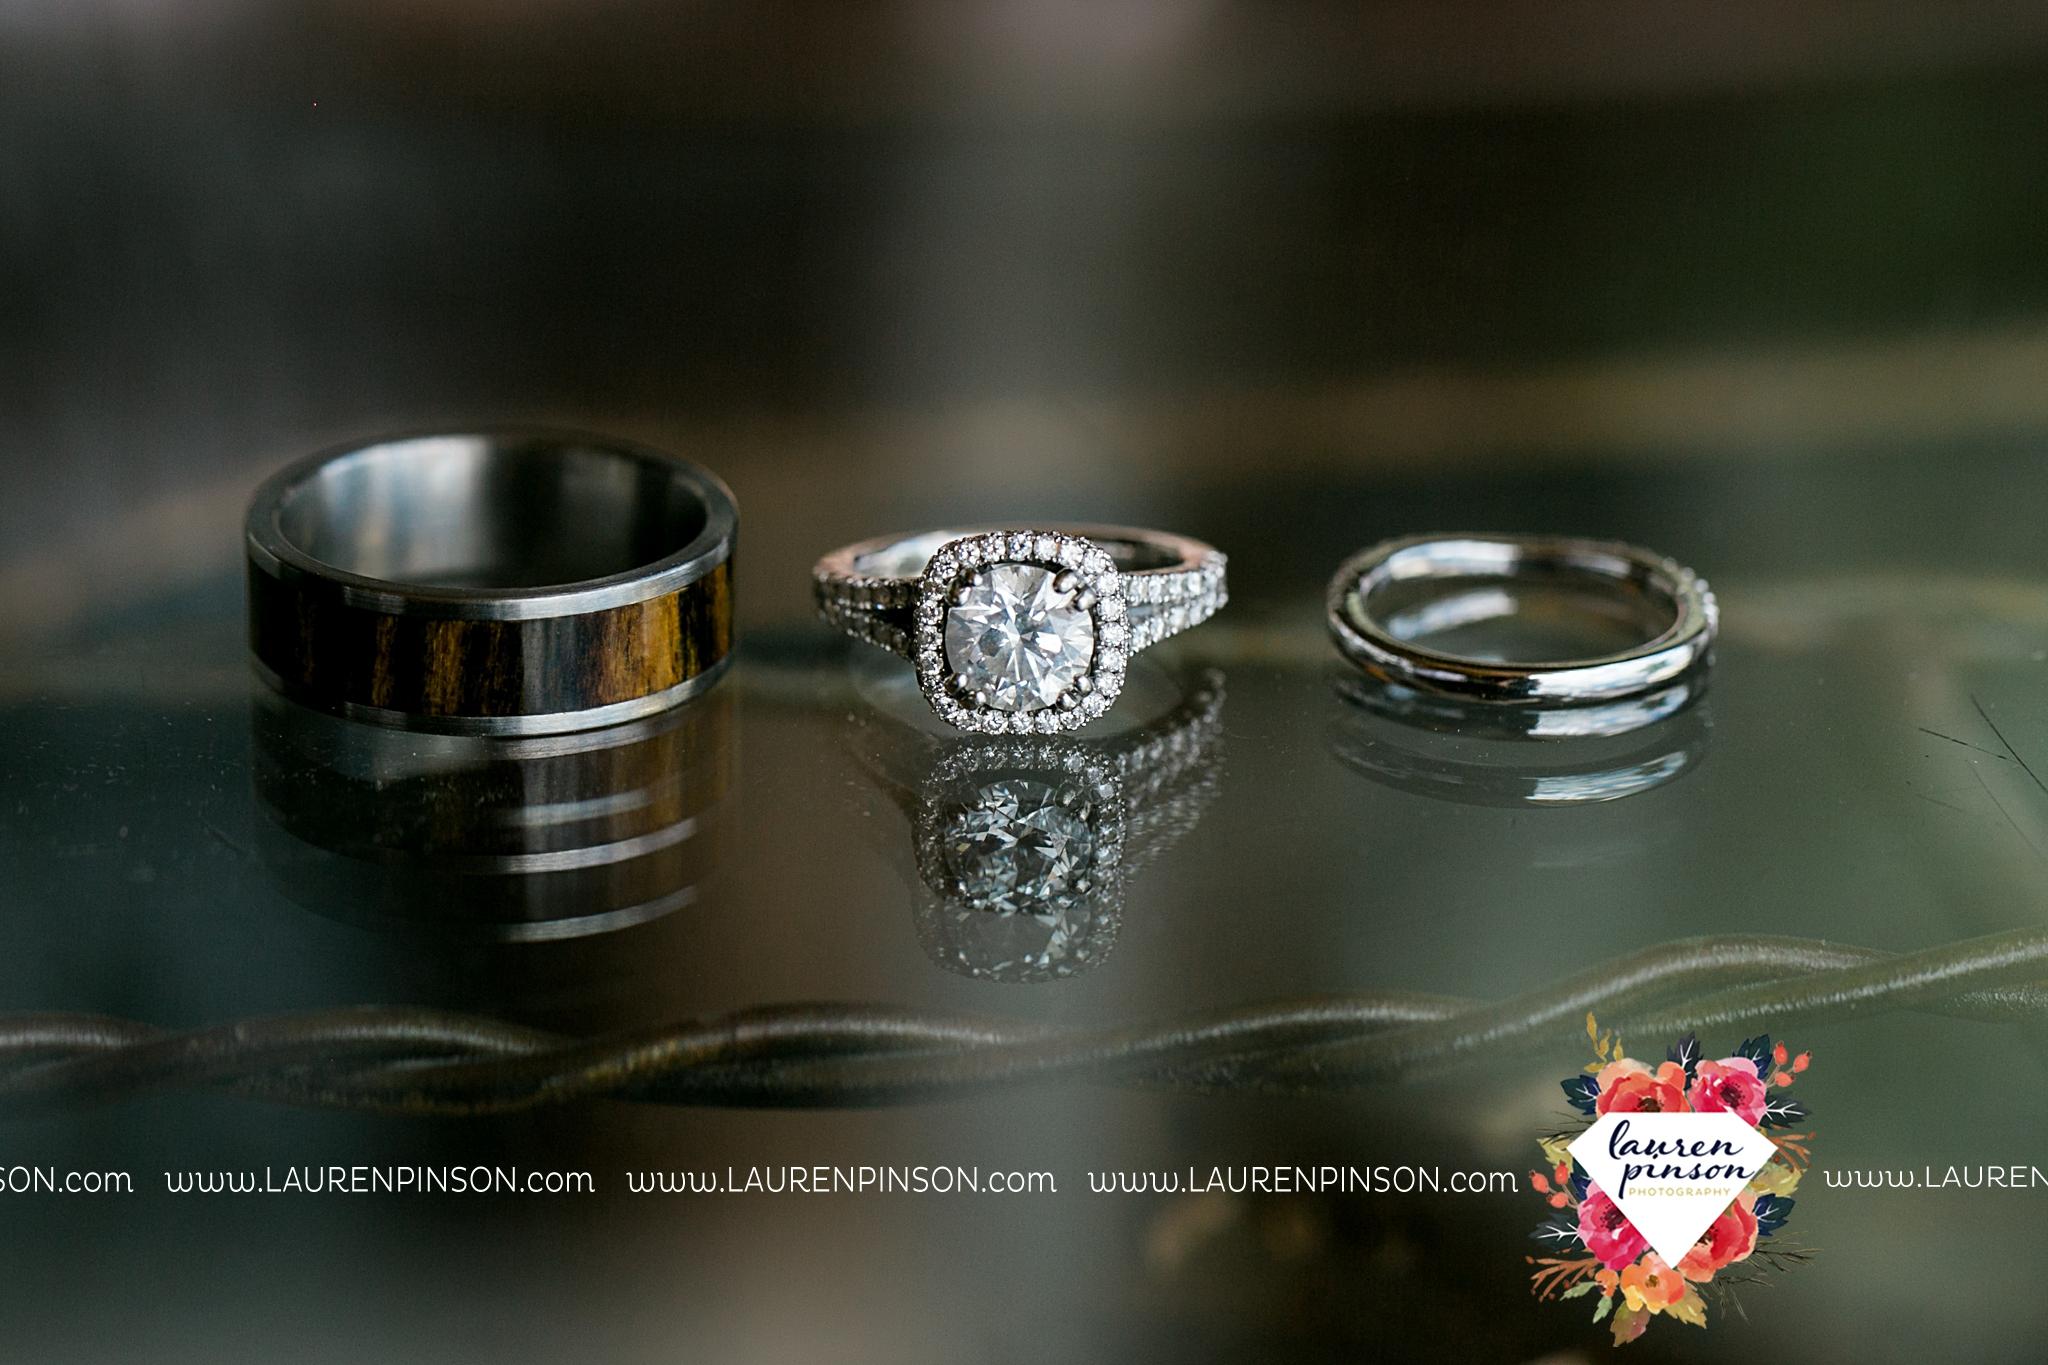 jones-barn-willow-creek-ranch-wedding-in-cleburne-texas-fort-worth-dfw-wichita-falls-wedding-photography_3187.jpg